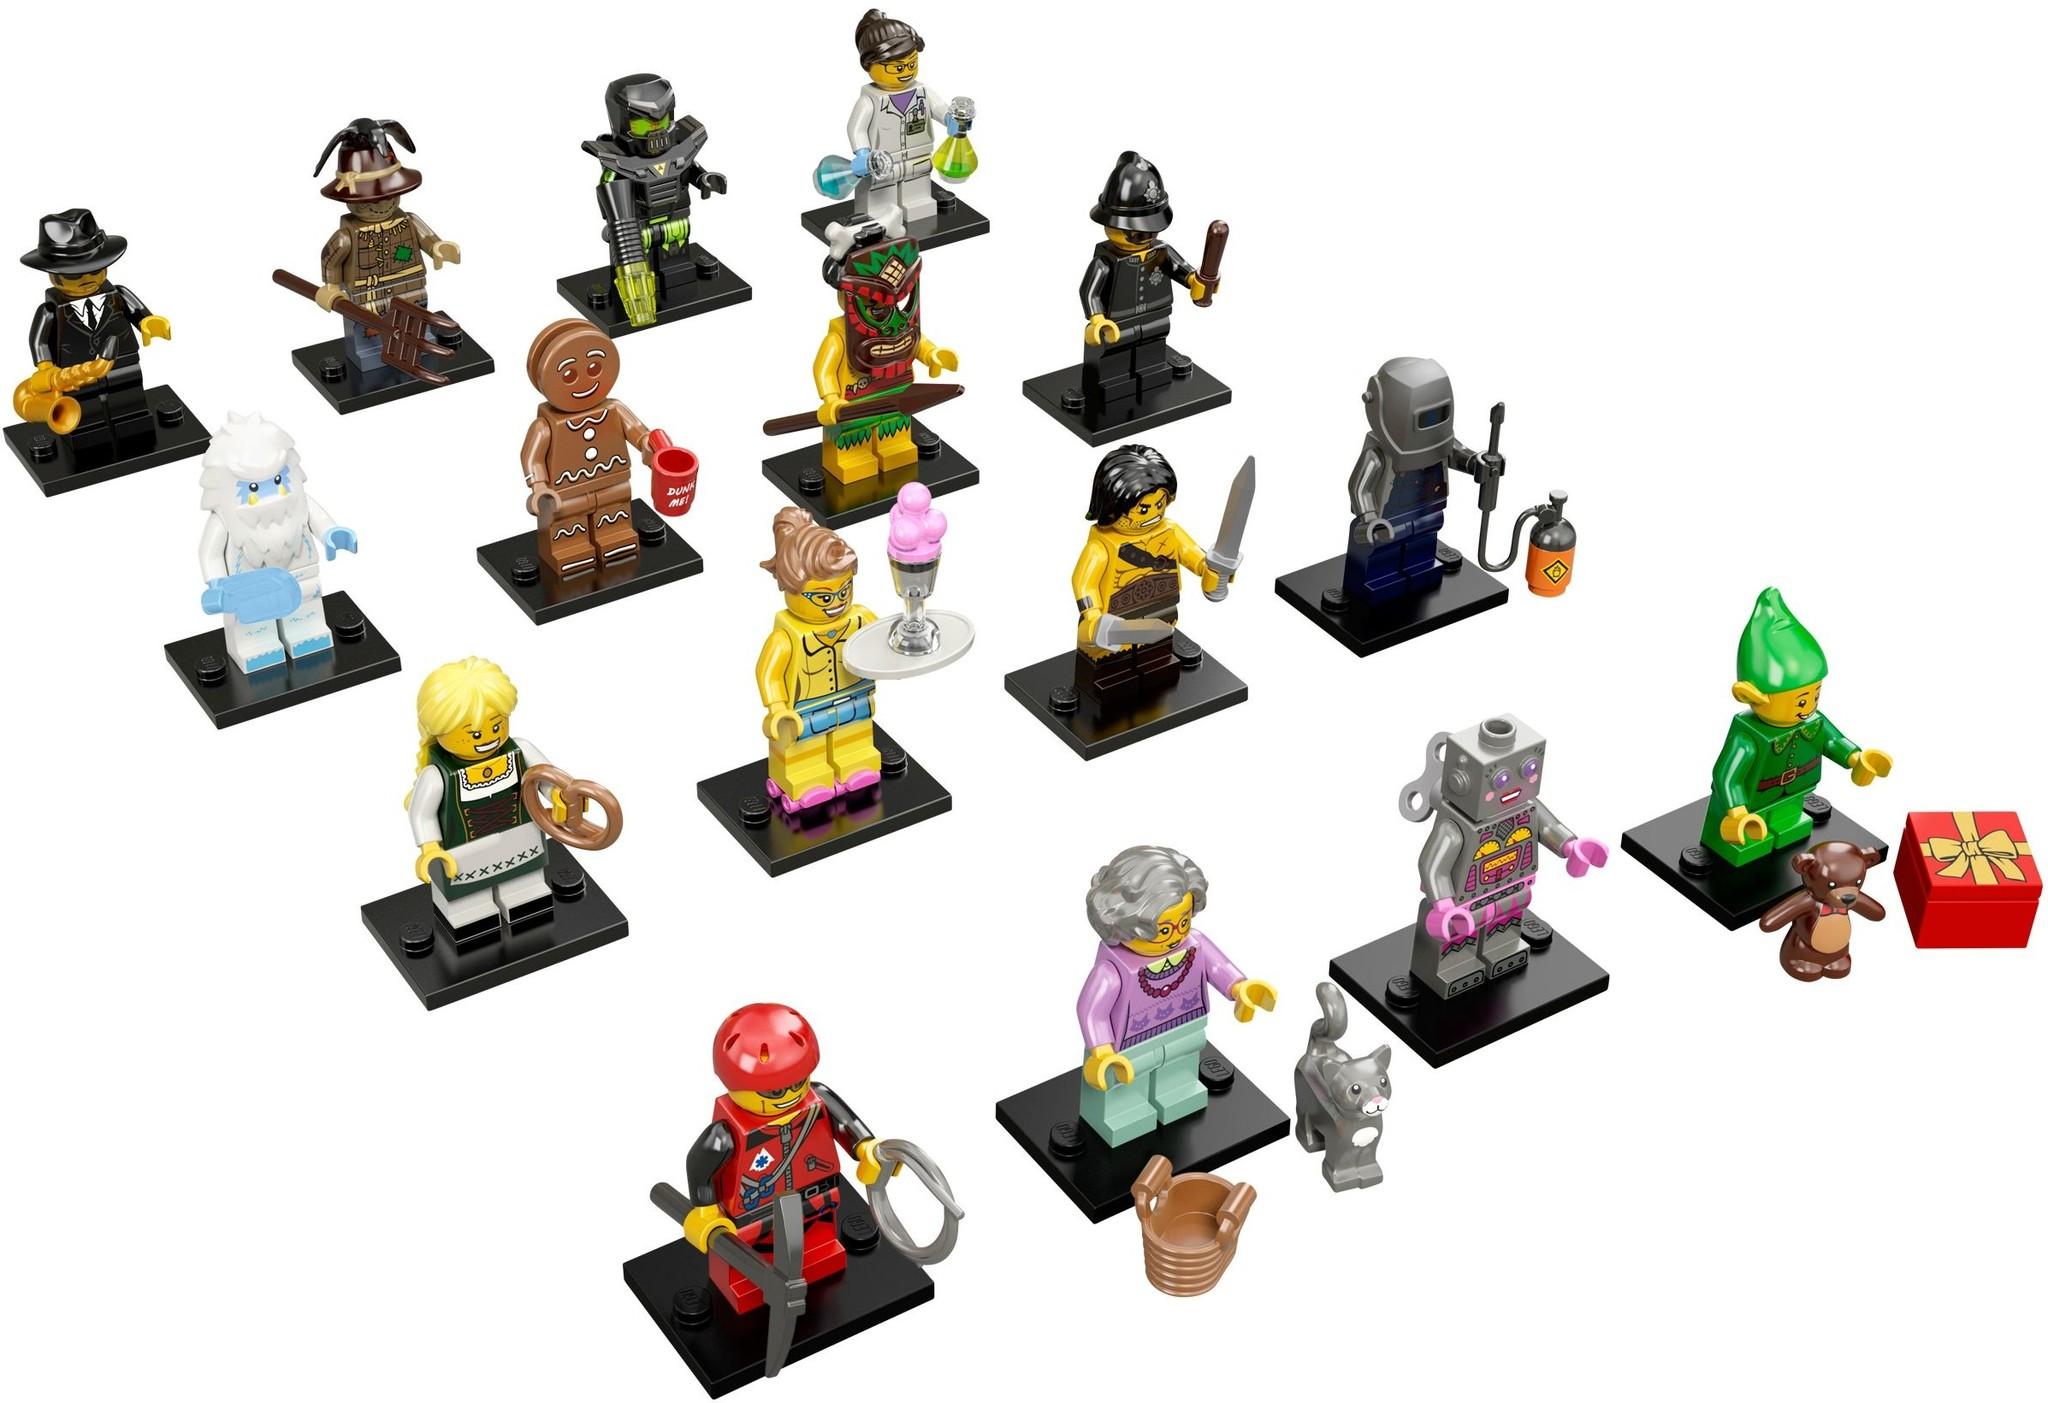 LEGO 71002 - LEGO Minifigures Series 11 Complete Full Set (16pcs) MISP